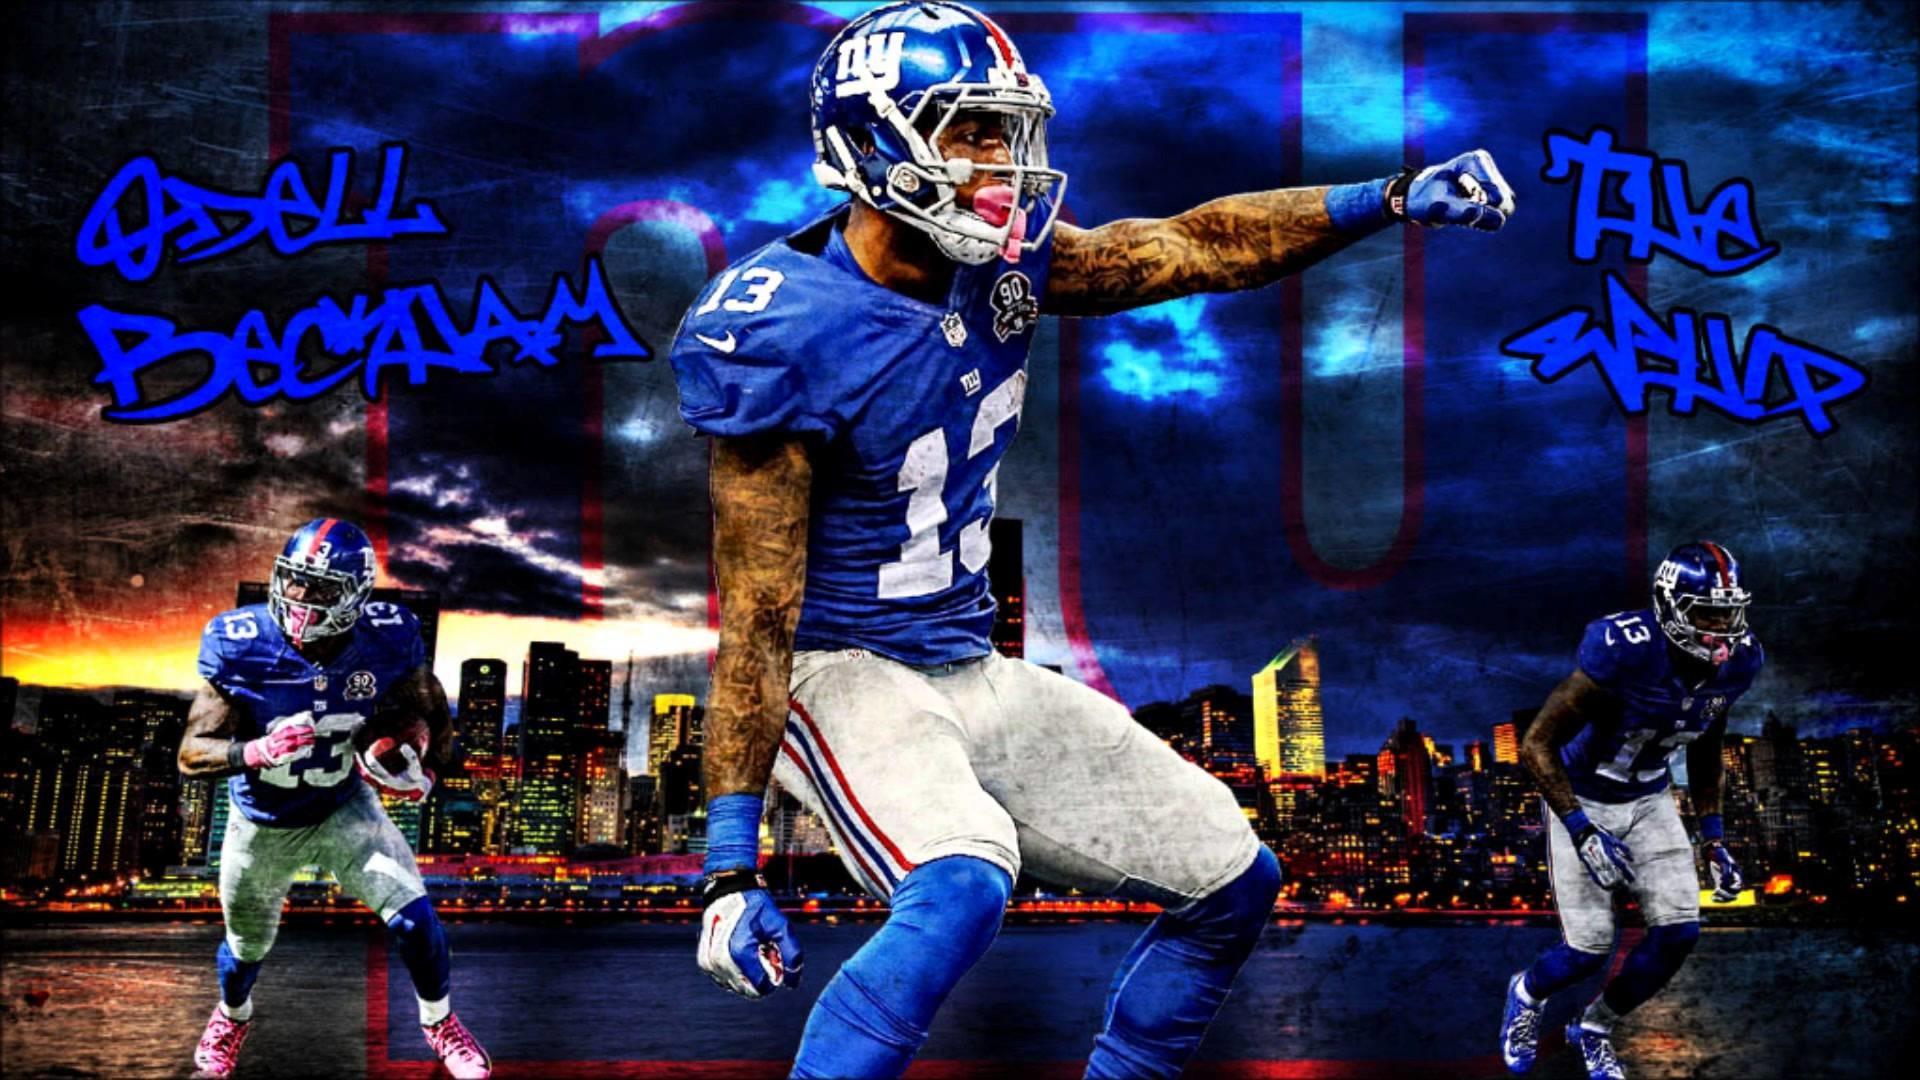 FREE NFL Odell Beckham Jr Wallpaper